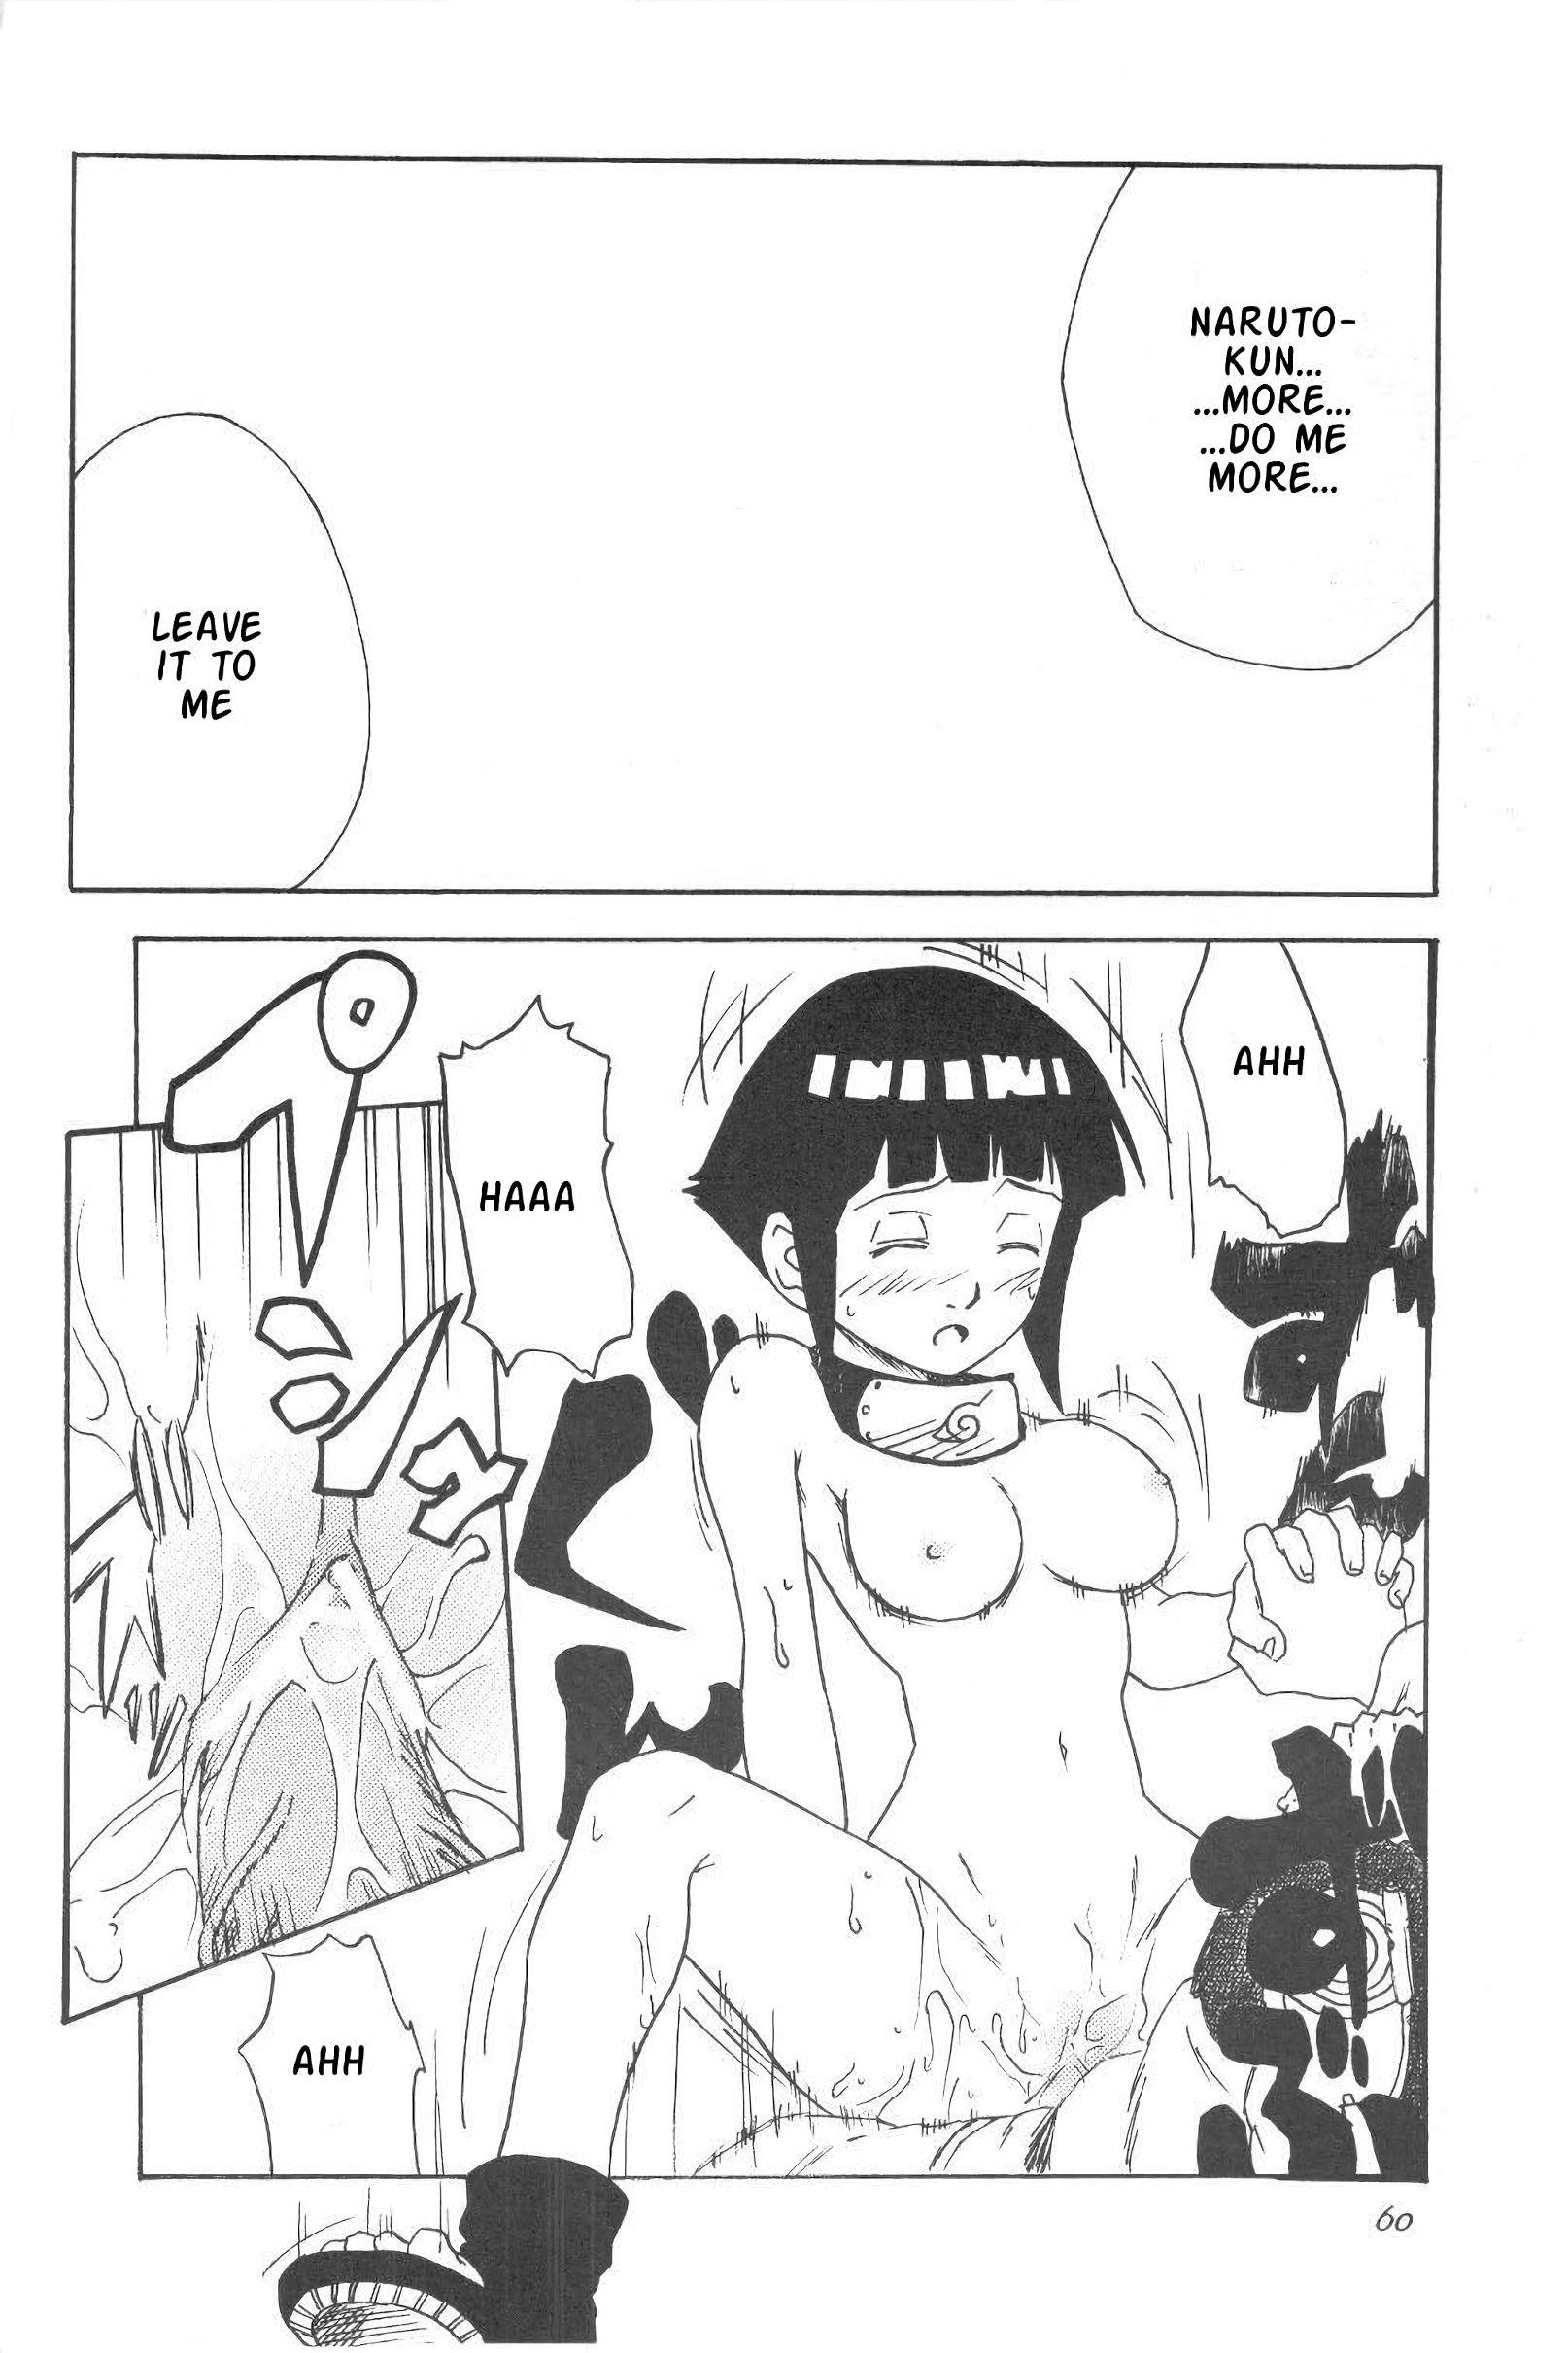 Howling dog hentai manga picture 56